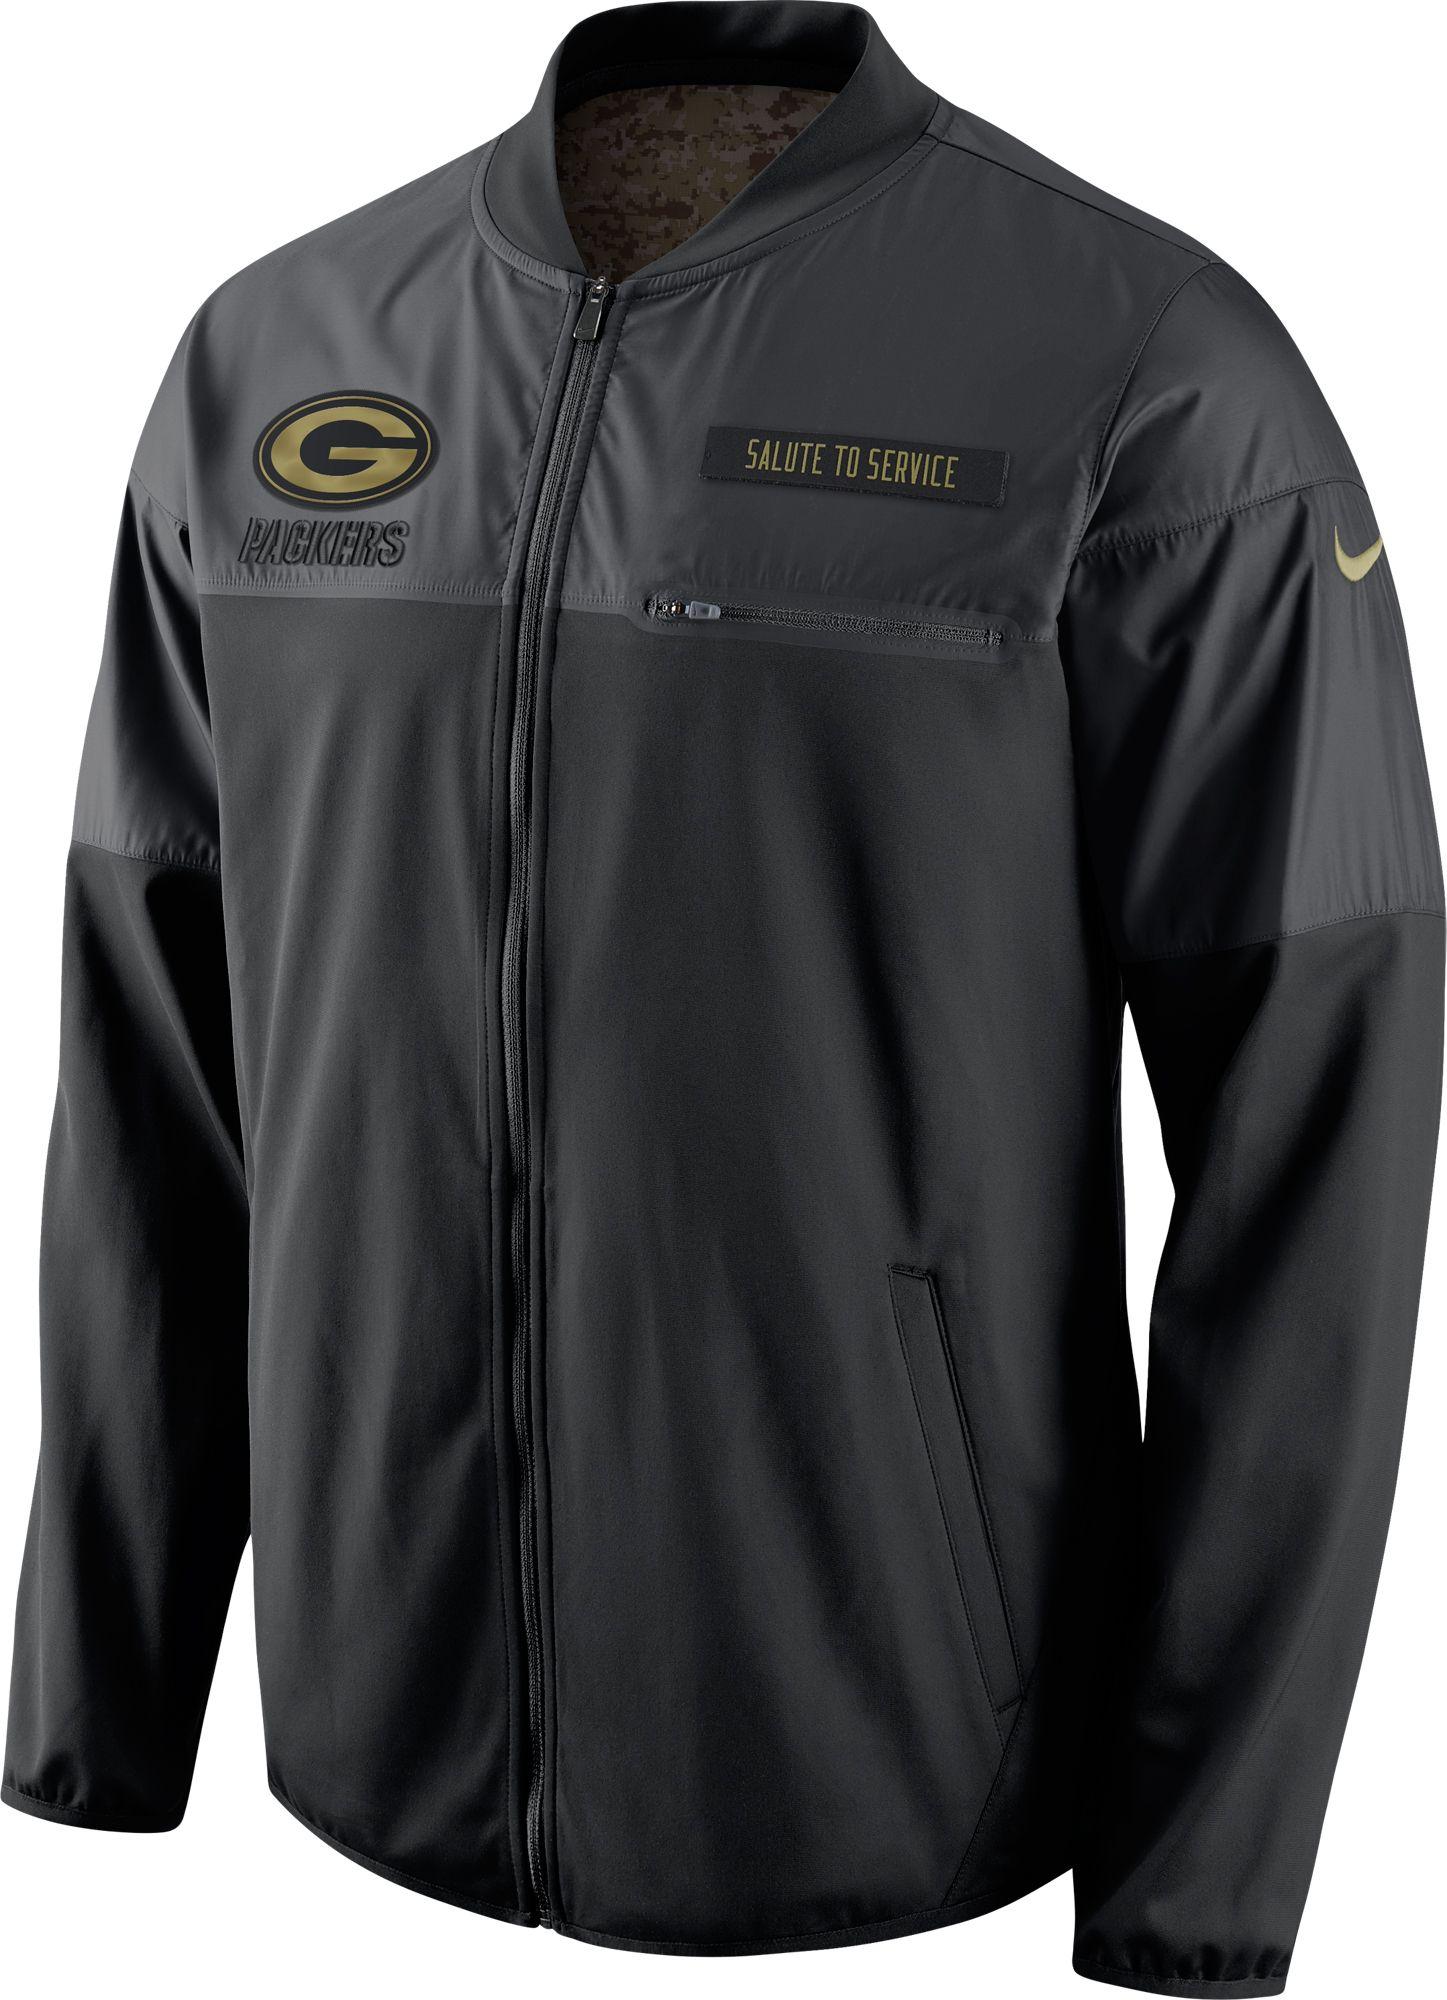 Nike jacket gray and black - Noimagefound